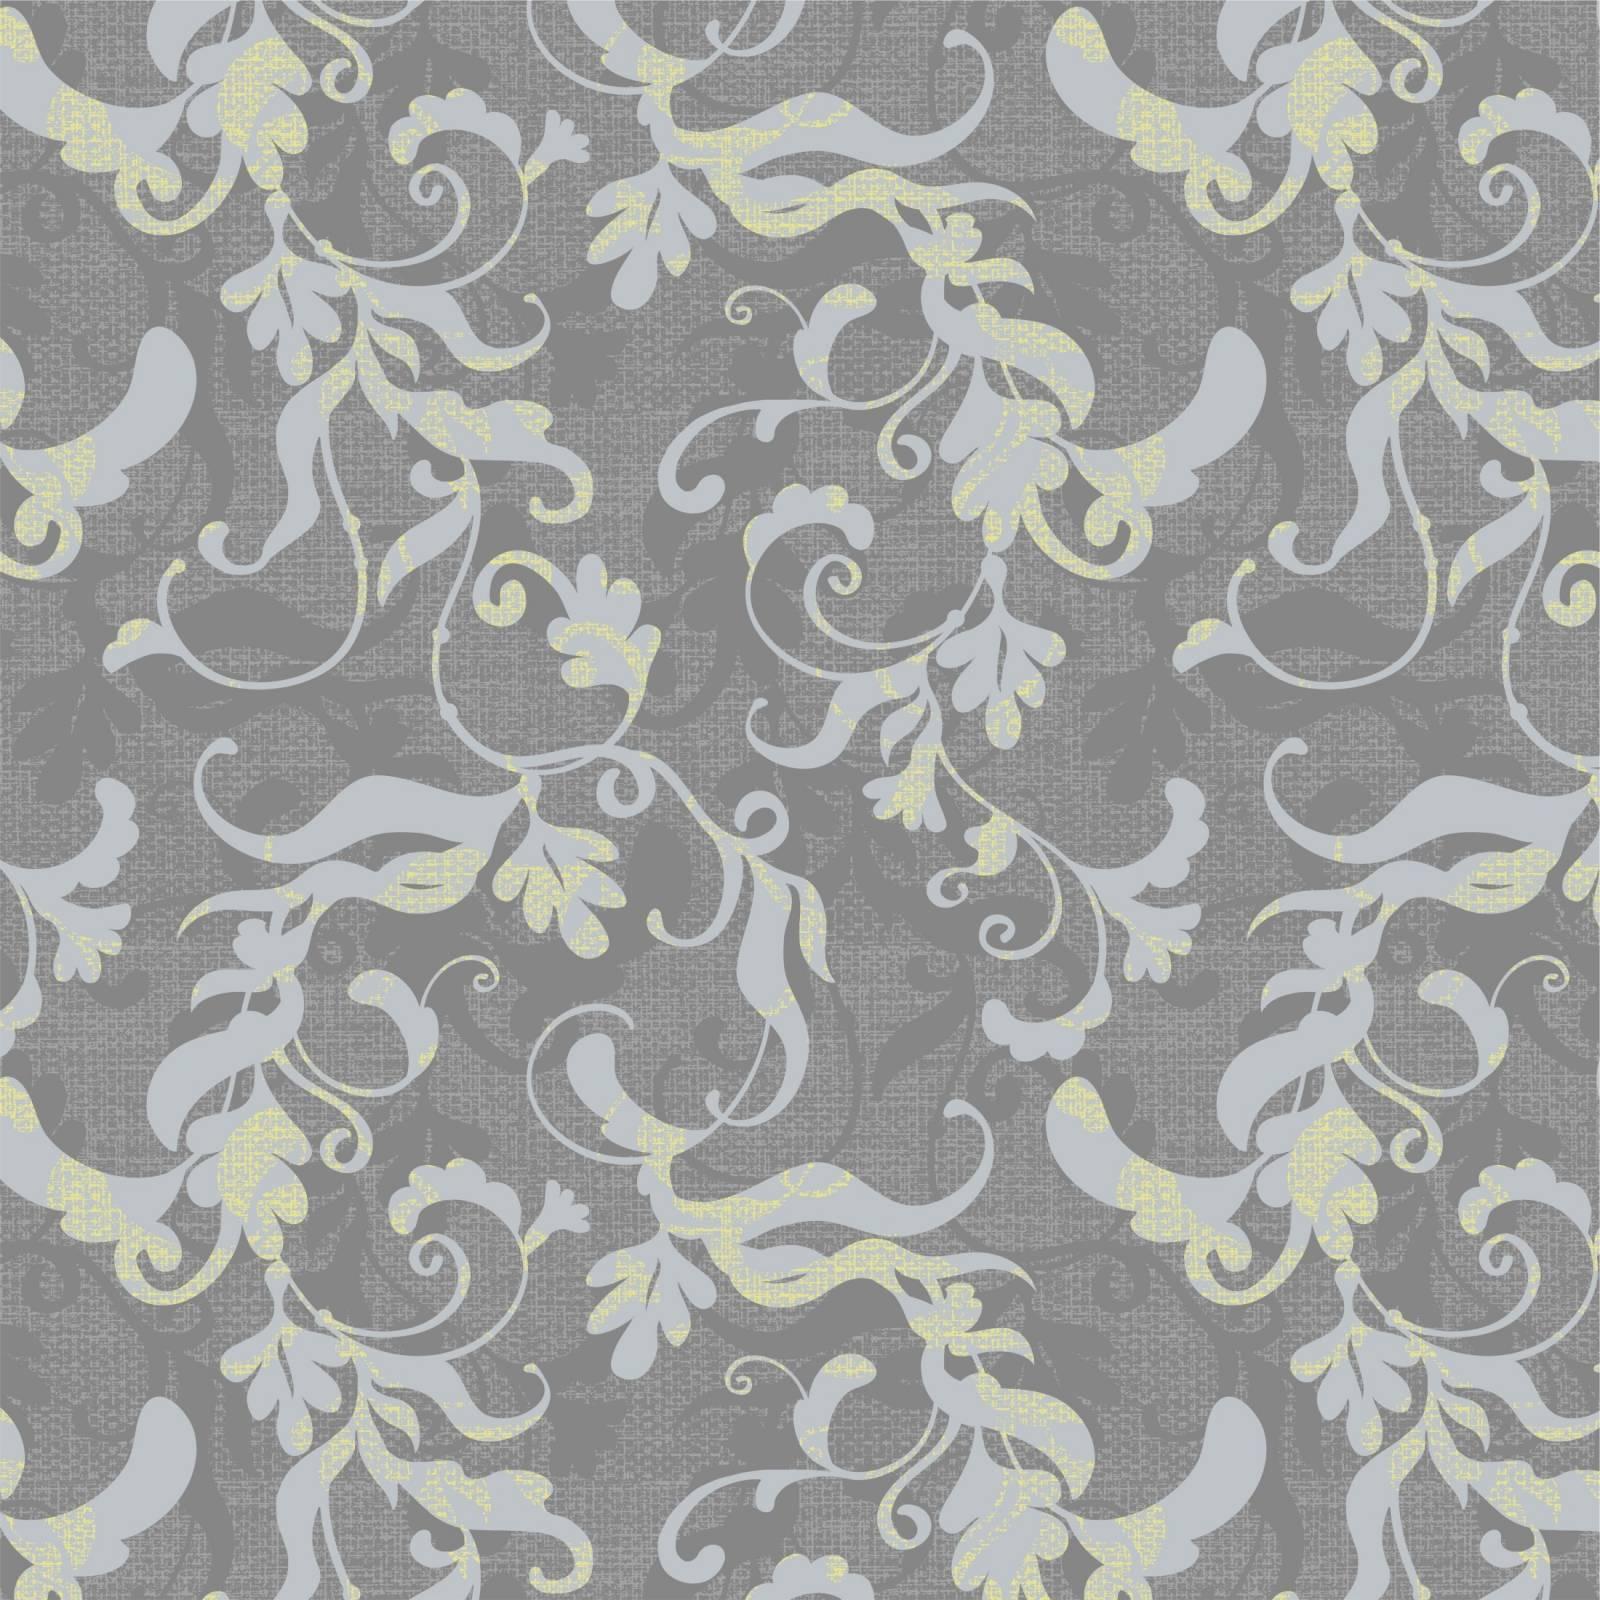 Papel de Parede Floral Cinza | Adesivo Vinílico imagem 1